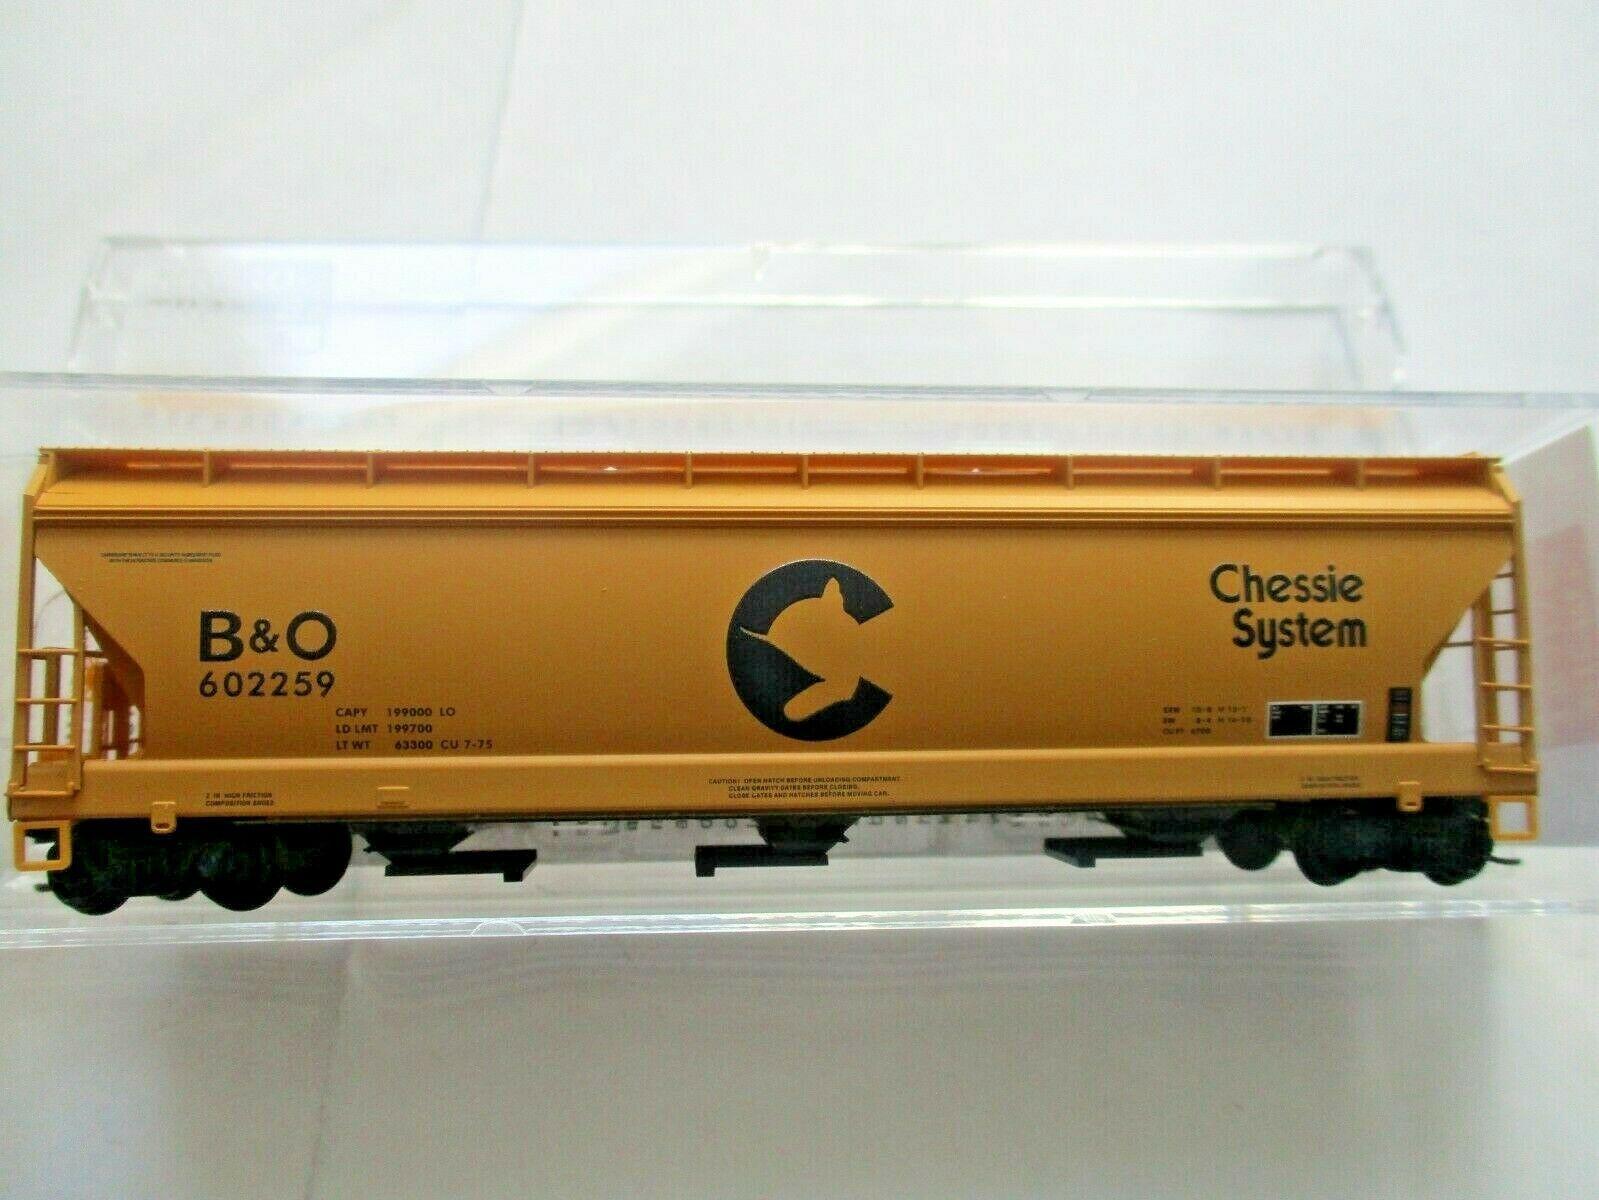 Micro-Trains # 09400660 Chessie/B&O 3-Bay Covered Hopper w/ Elongated Hatches (N